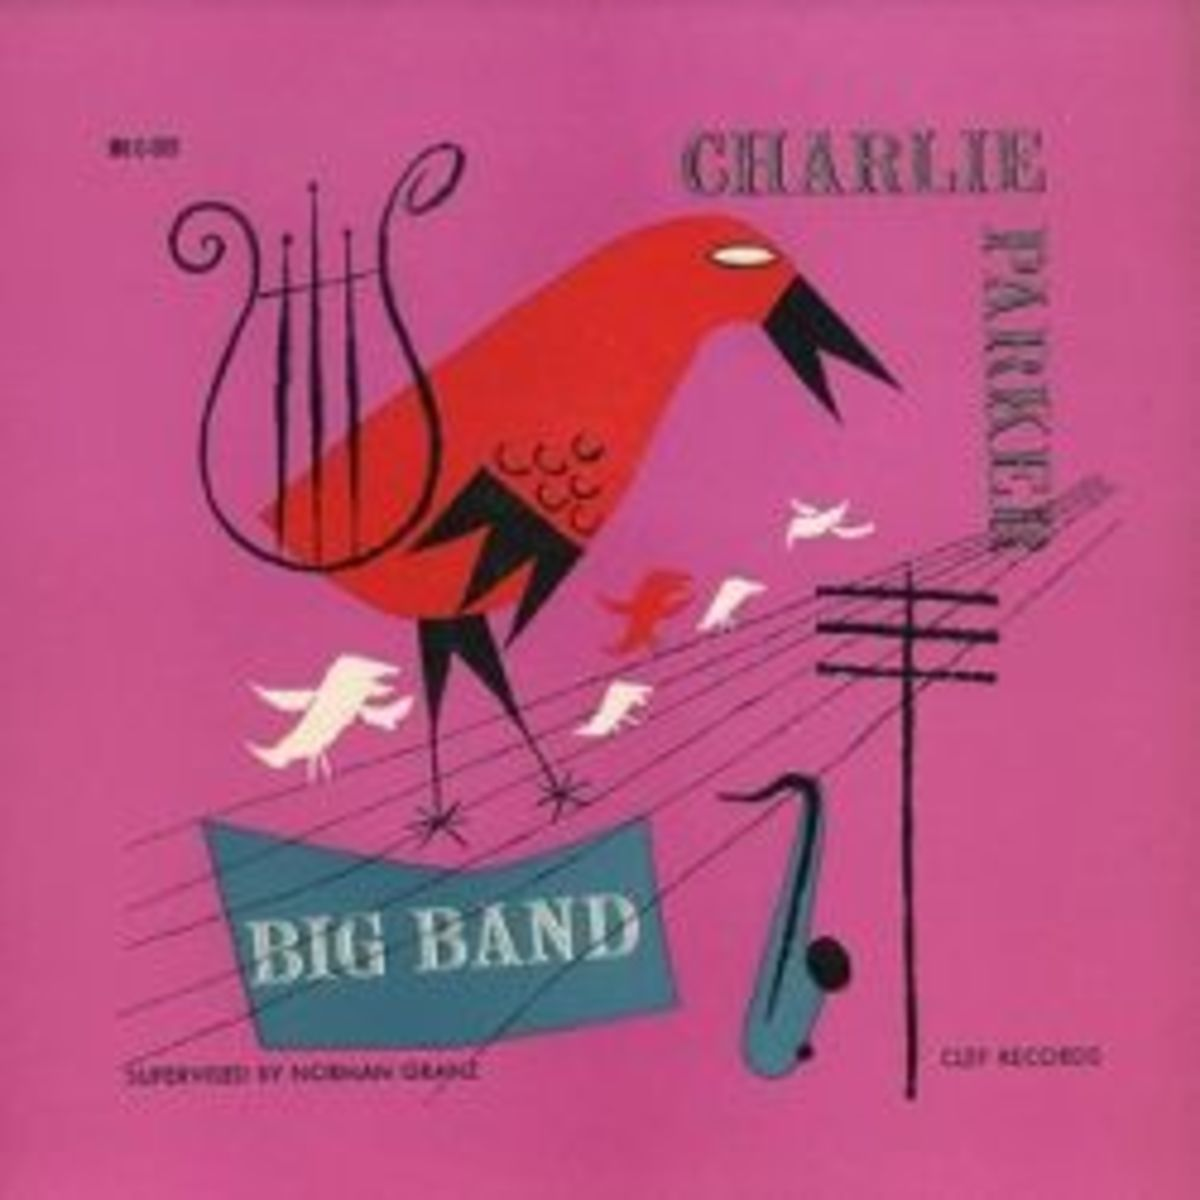 "Charlie Parker ""Charlie Parker Big Band"" Clef Records MG C-609 12"" LP Vinyl Record (1954) DSM Cover"